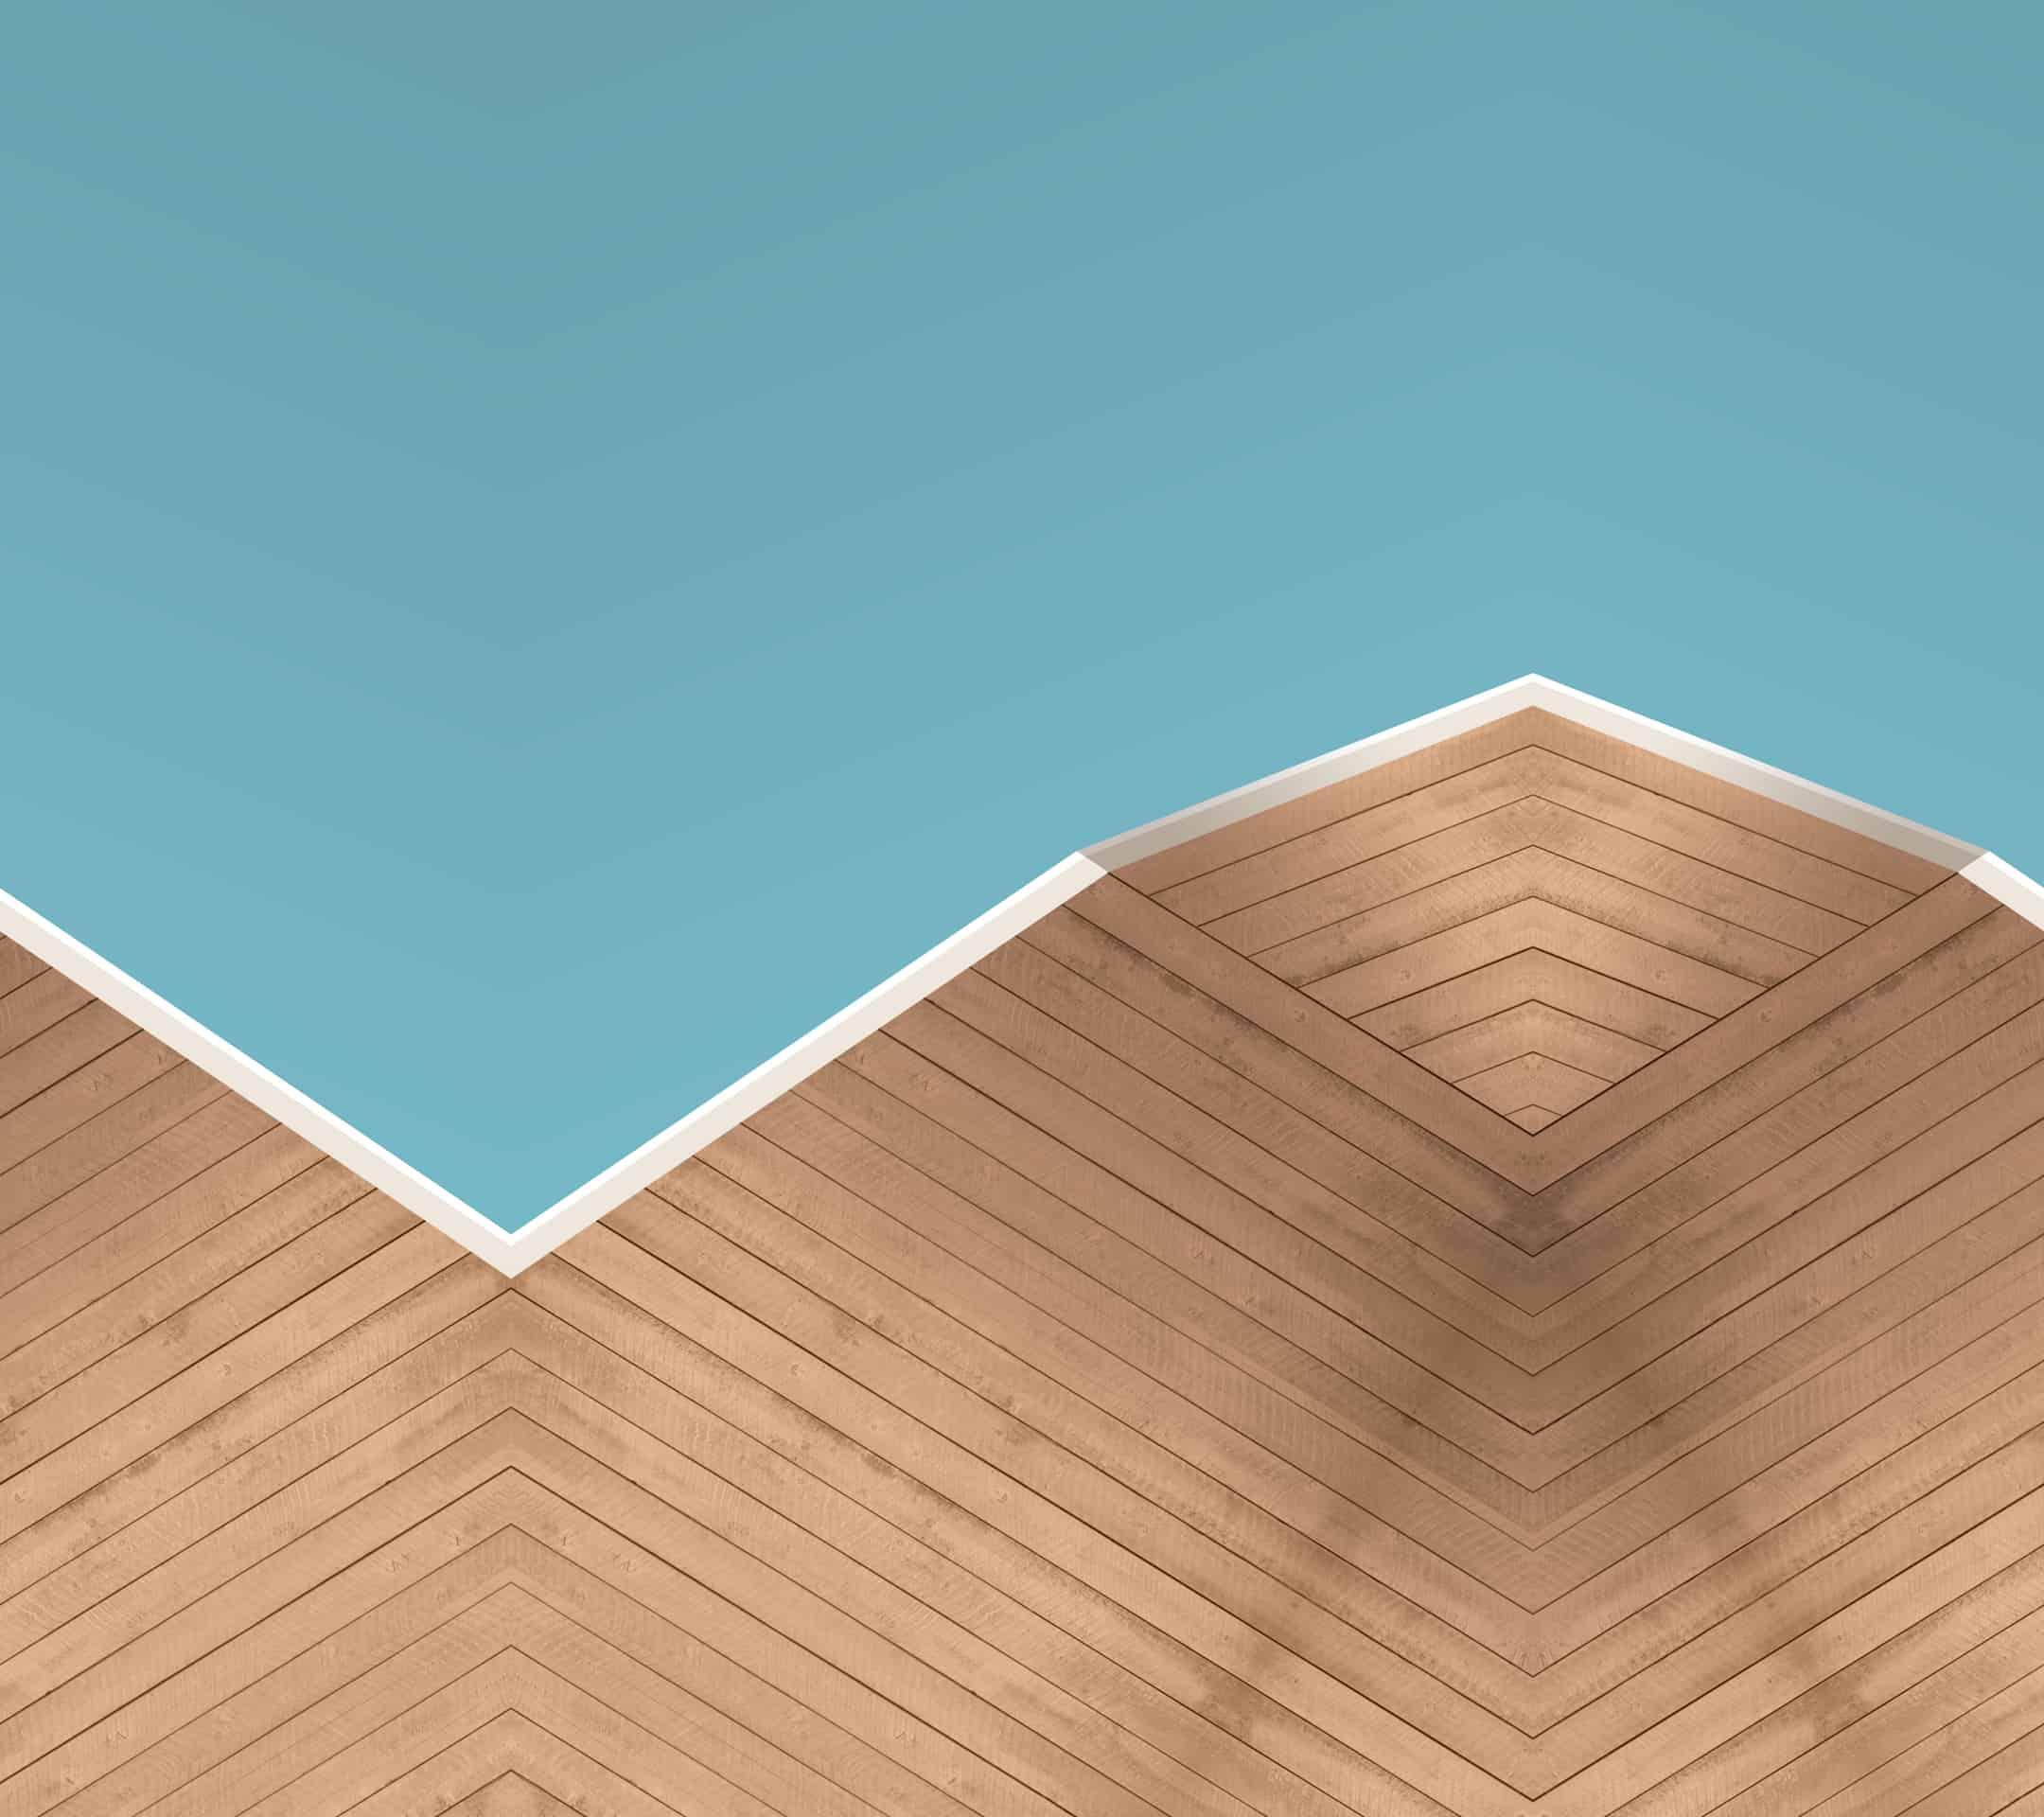 wallpapers_04